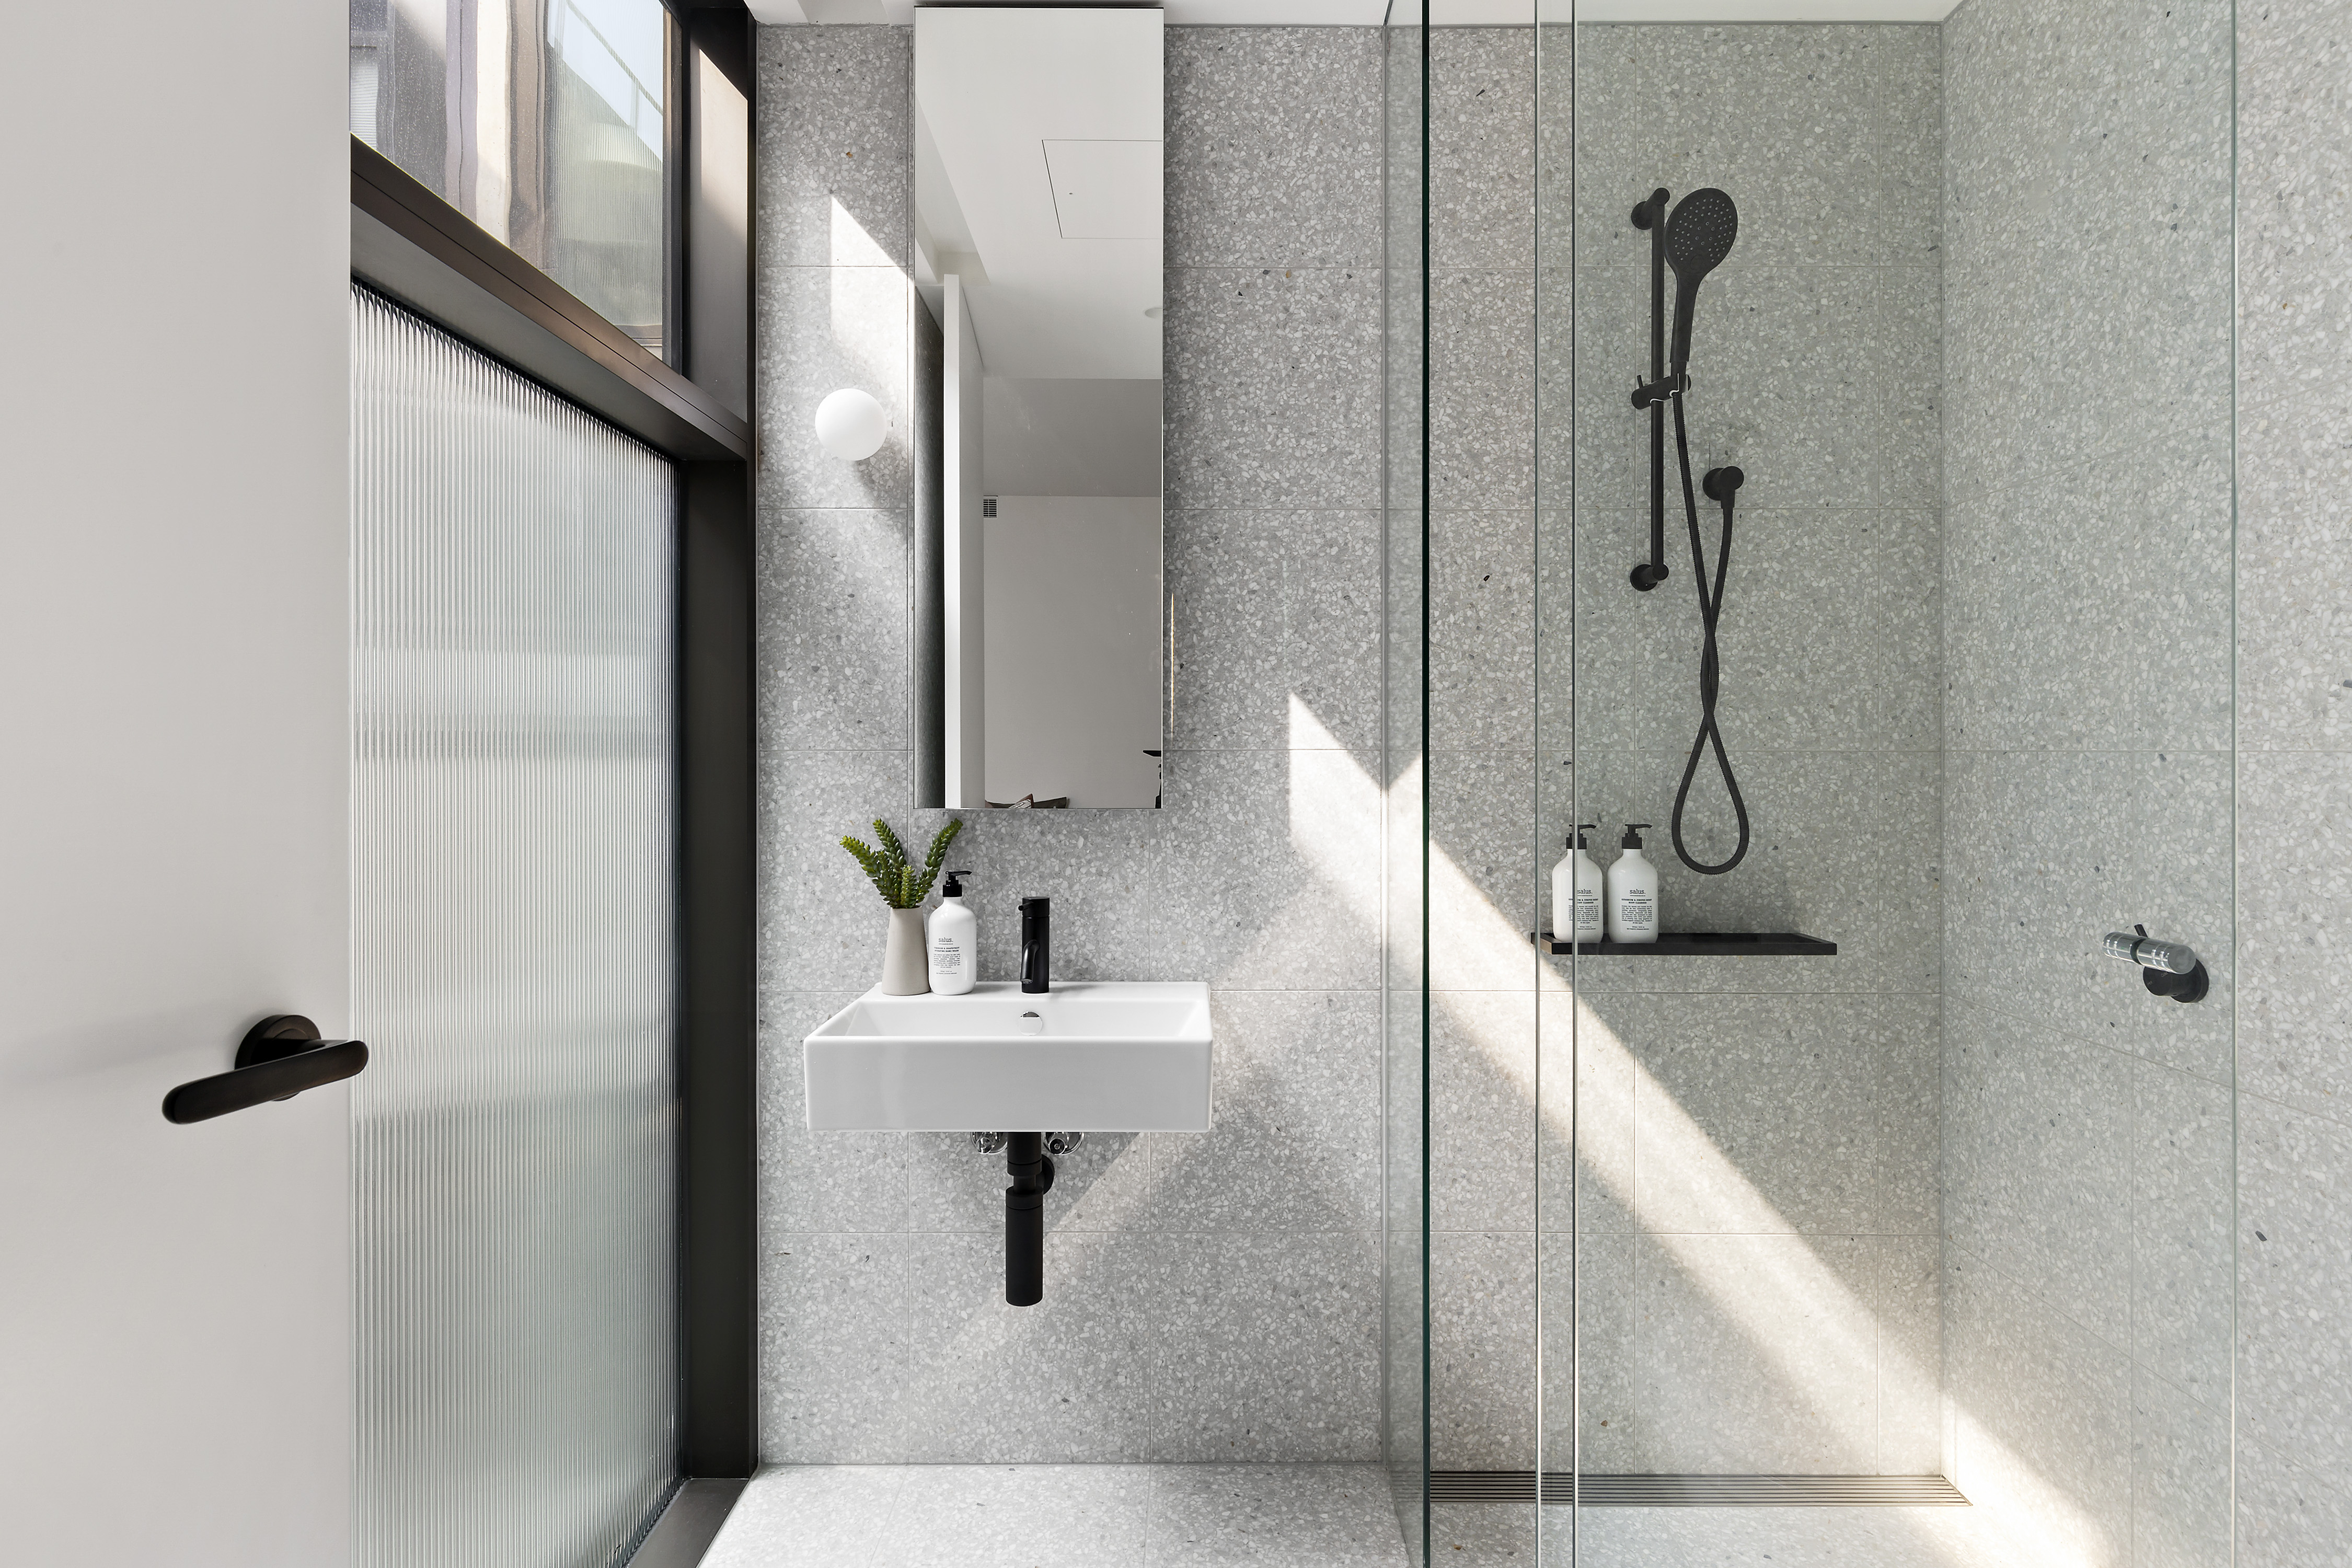 405-9-johnston-street-port-melbourne-student-accommodation-Melbourne-Bathroom-2-Unilodgers